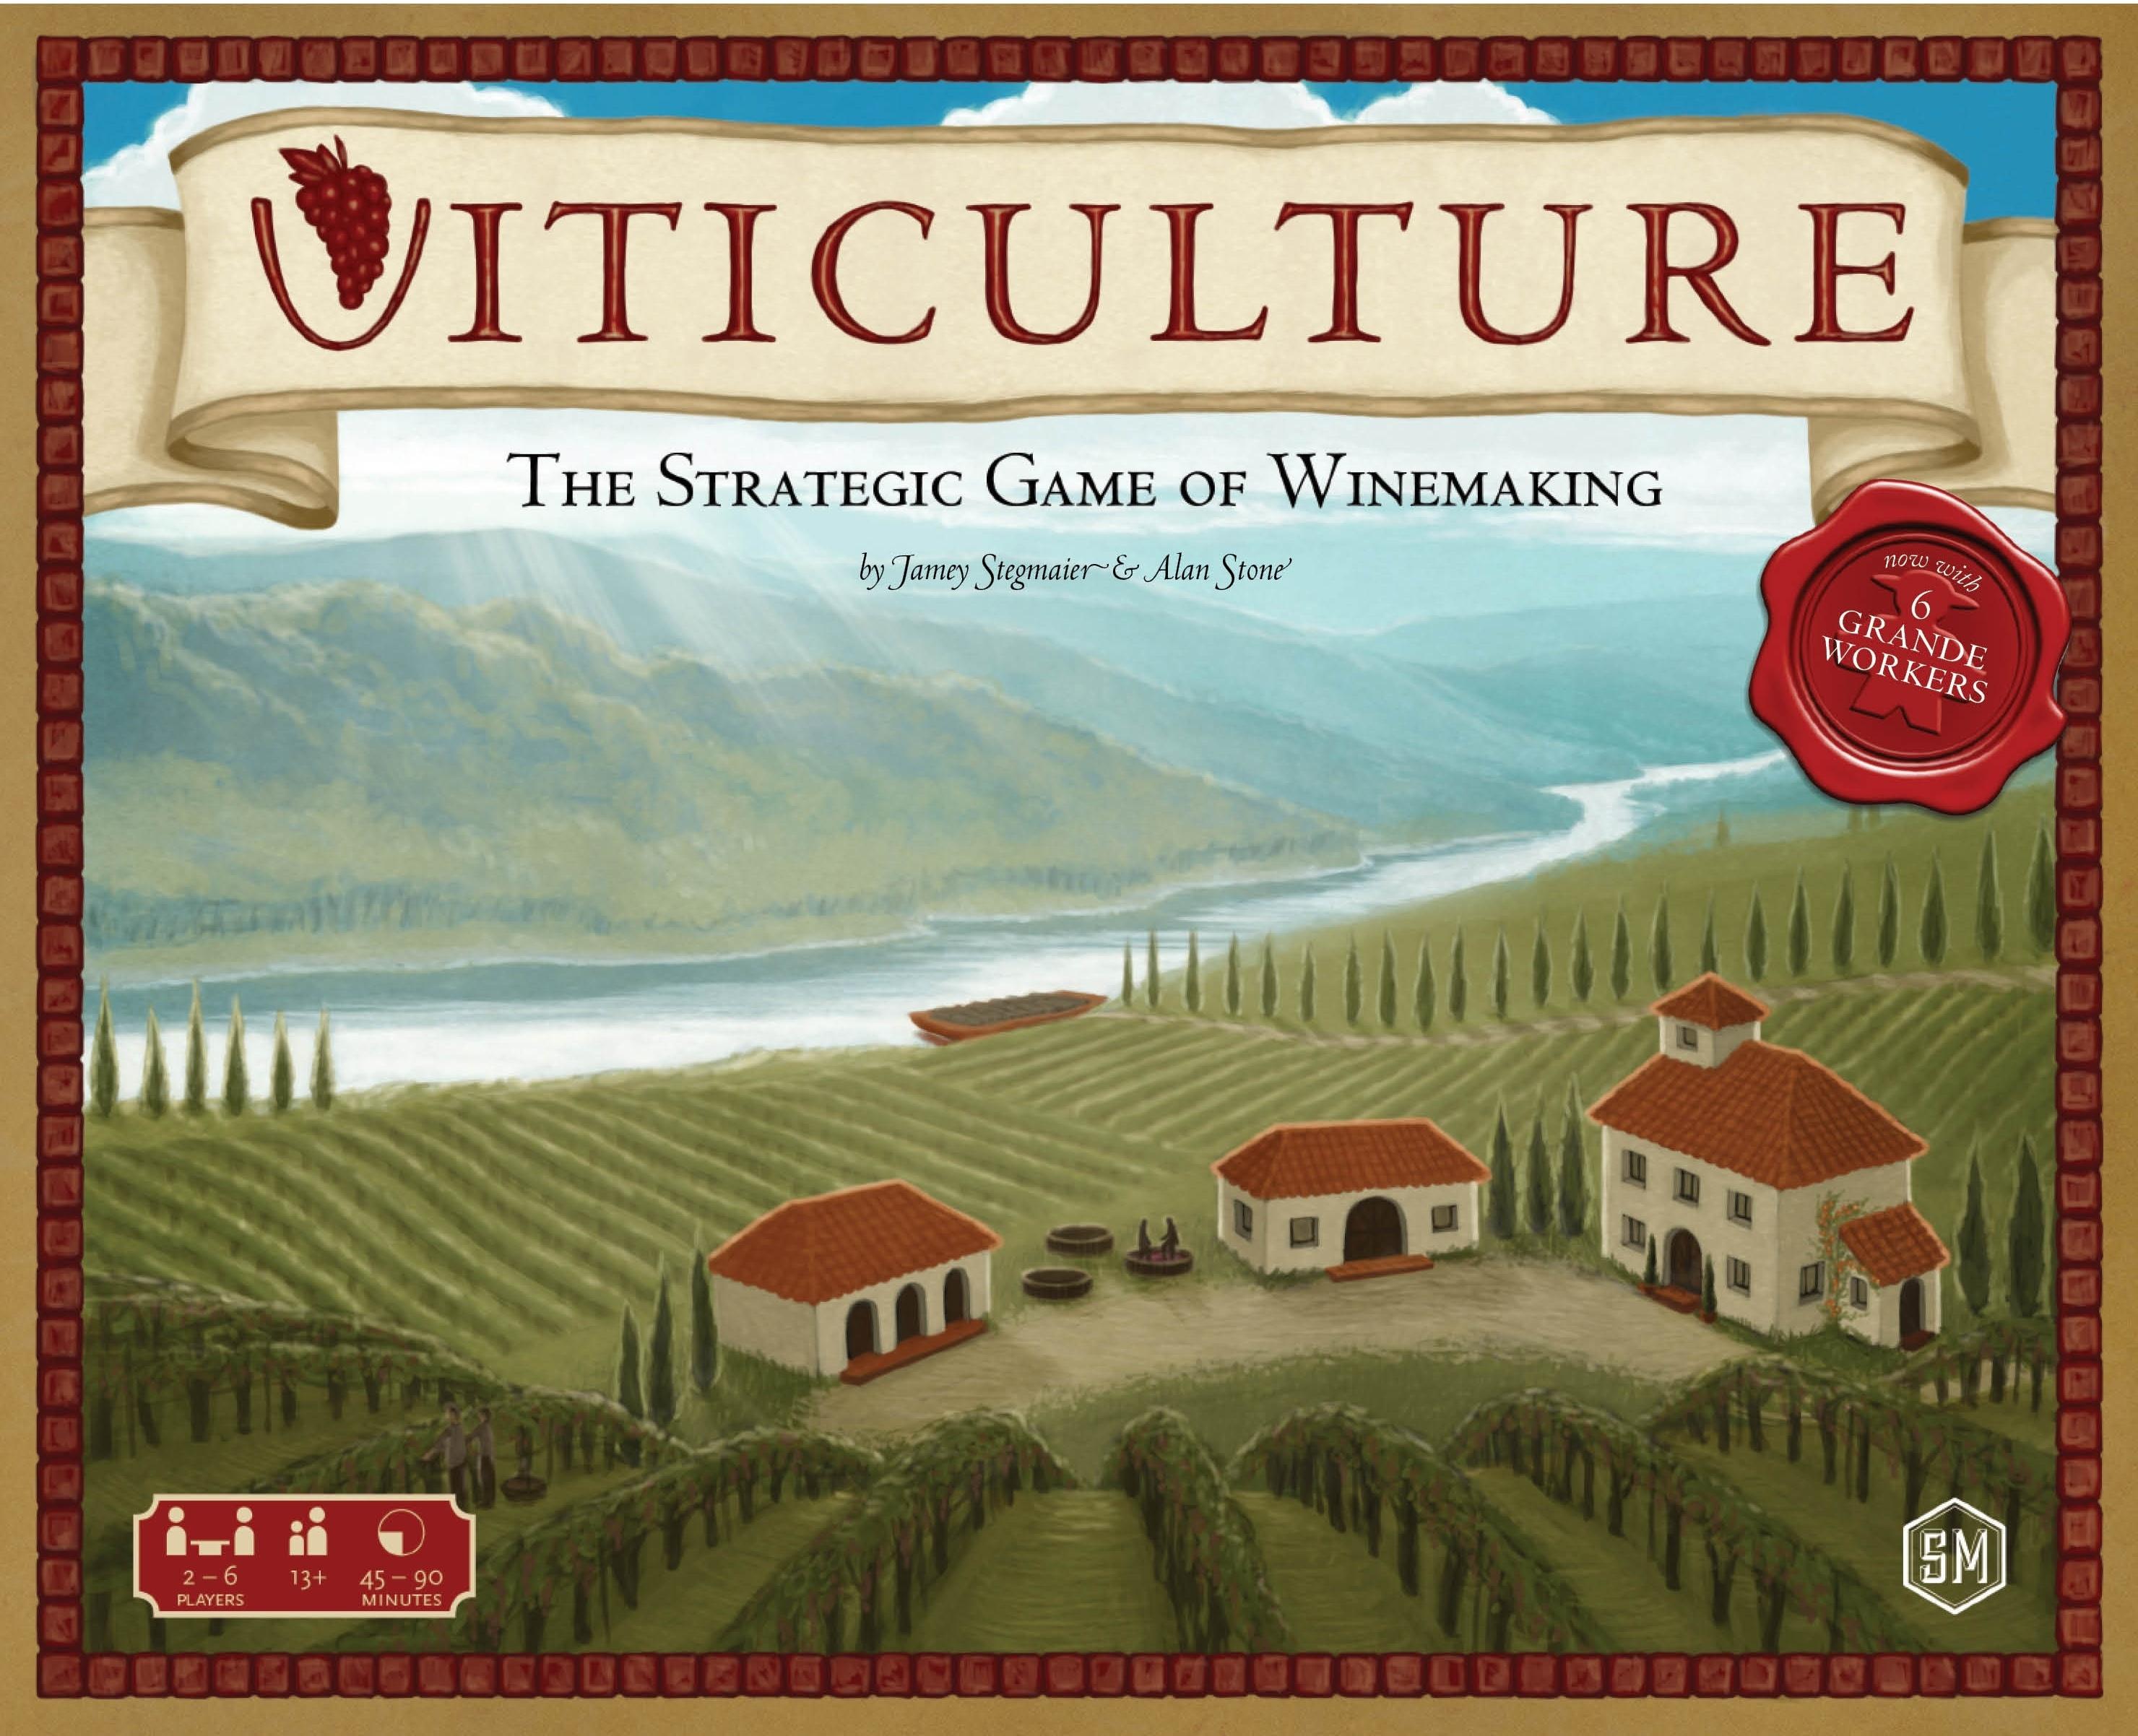 Viticulture, portada